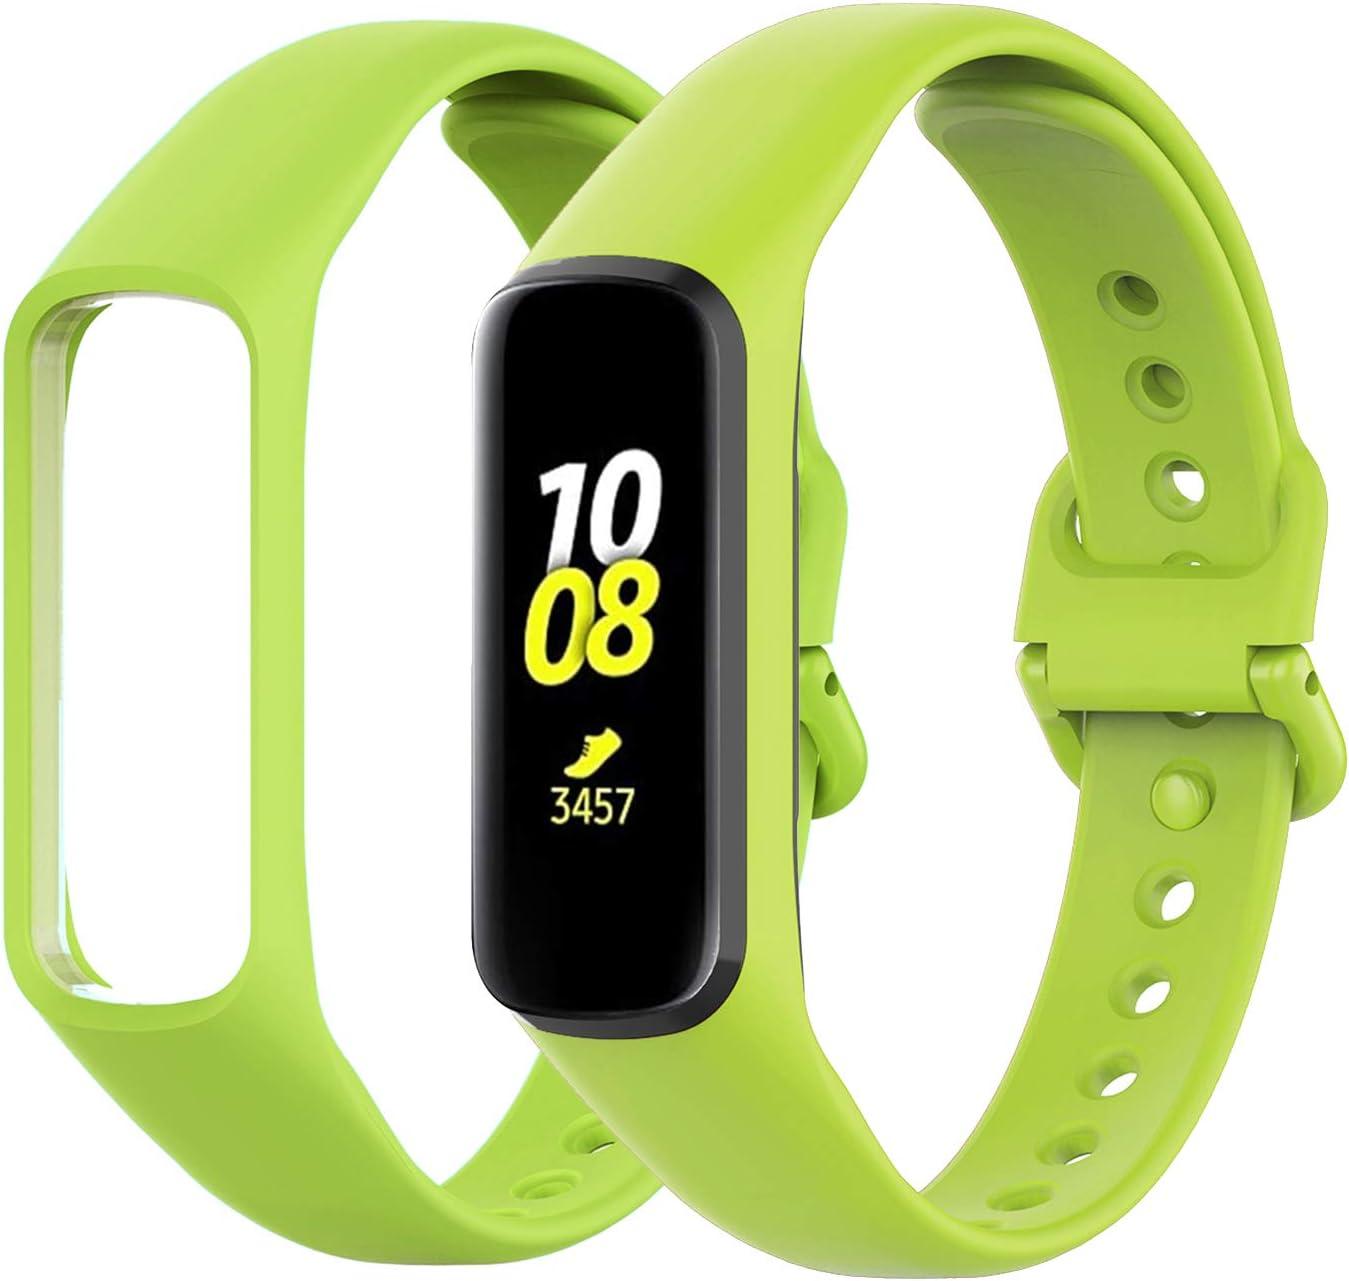 Malla Para Samsung Galaxy Fit 2 - Verde Lima